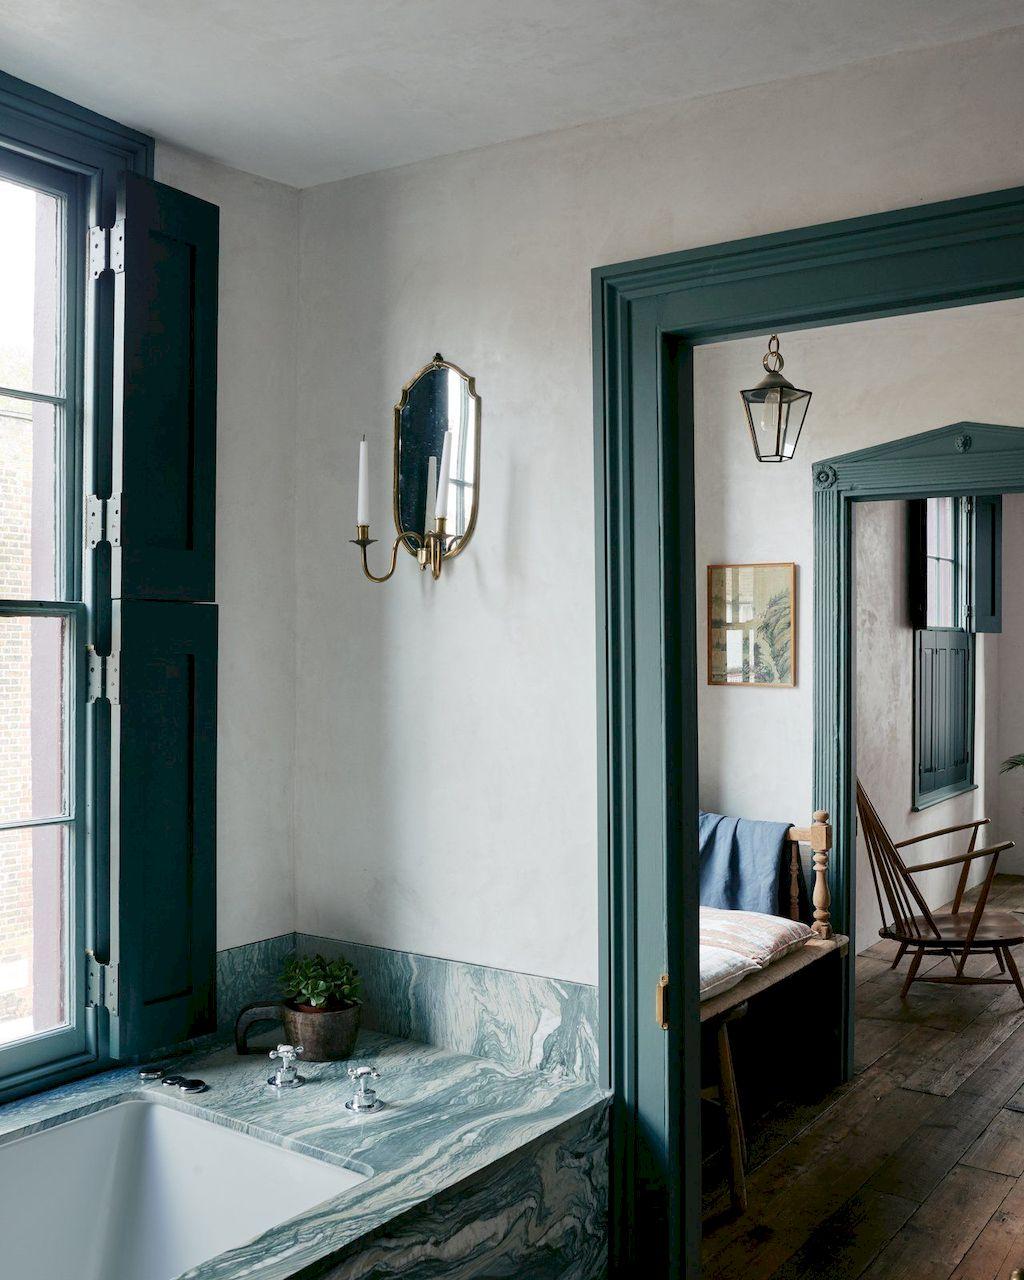 Surprising Stylish Color Scheme For Your Bathroom